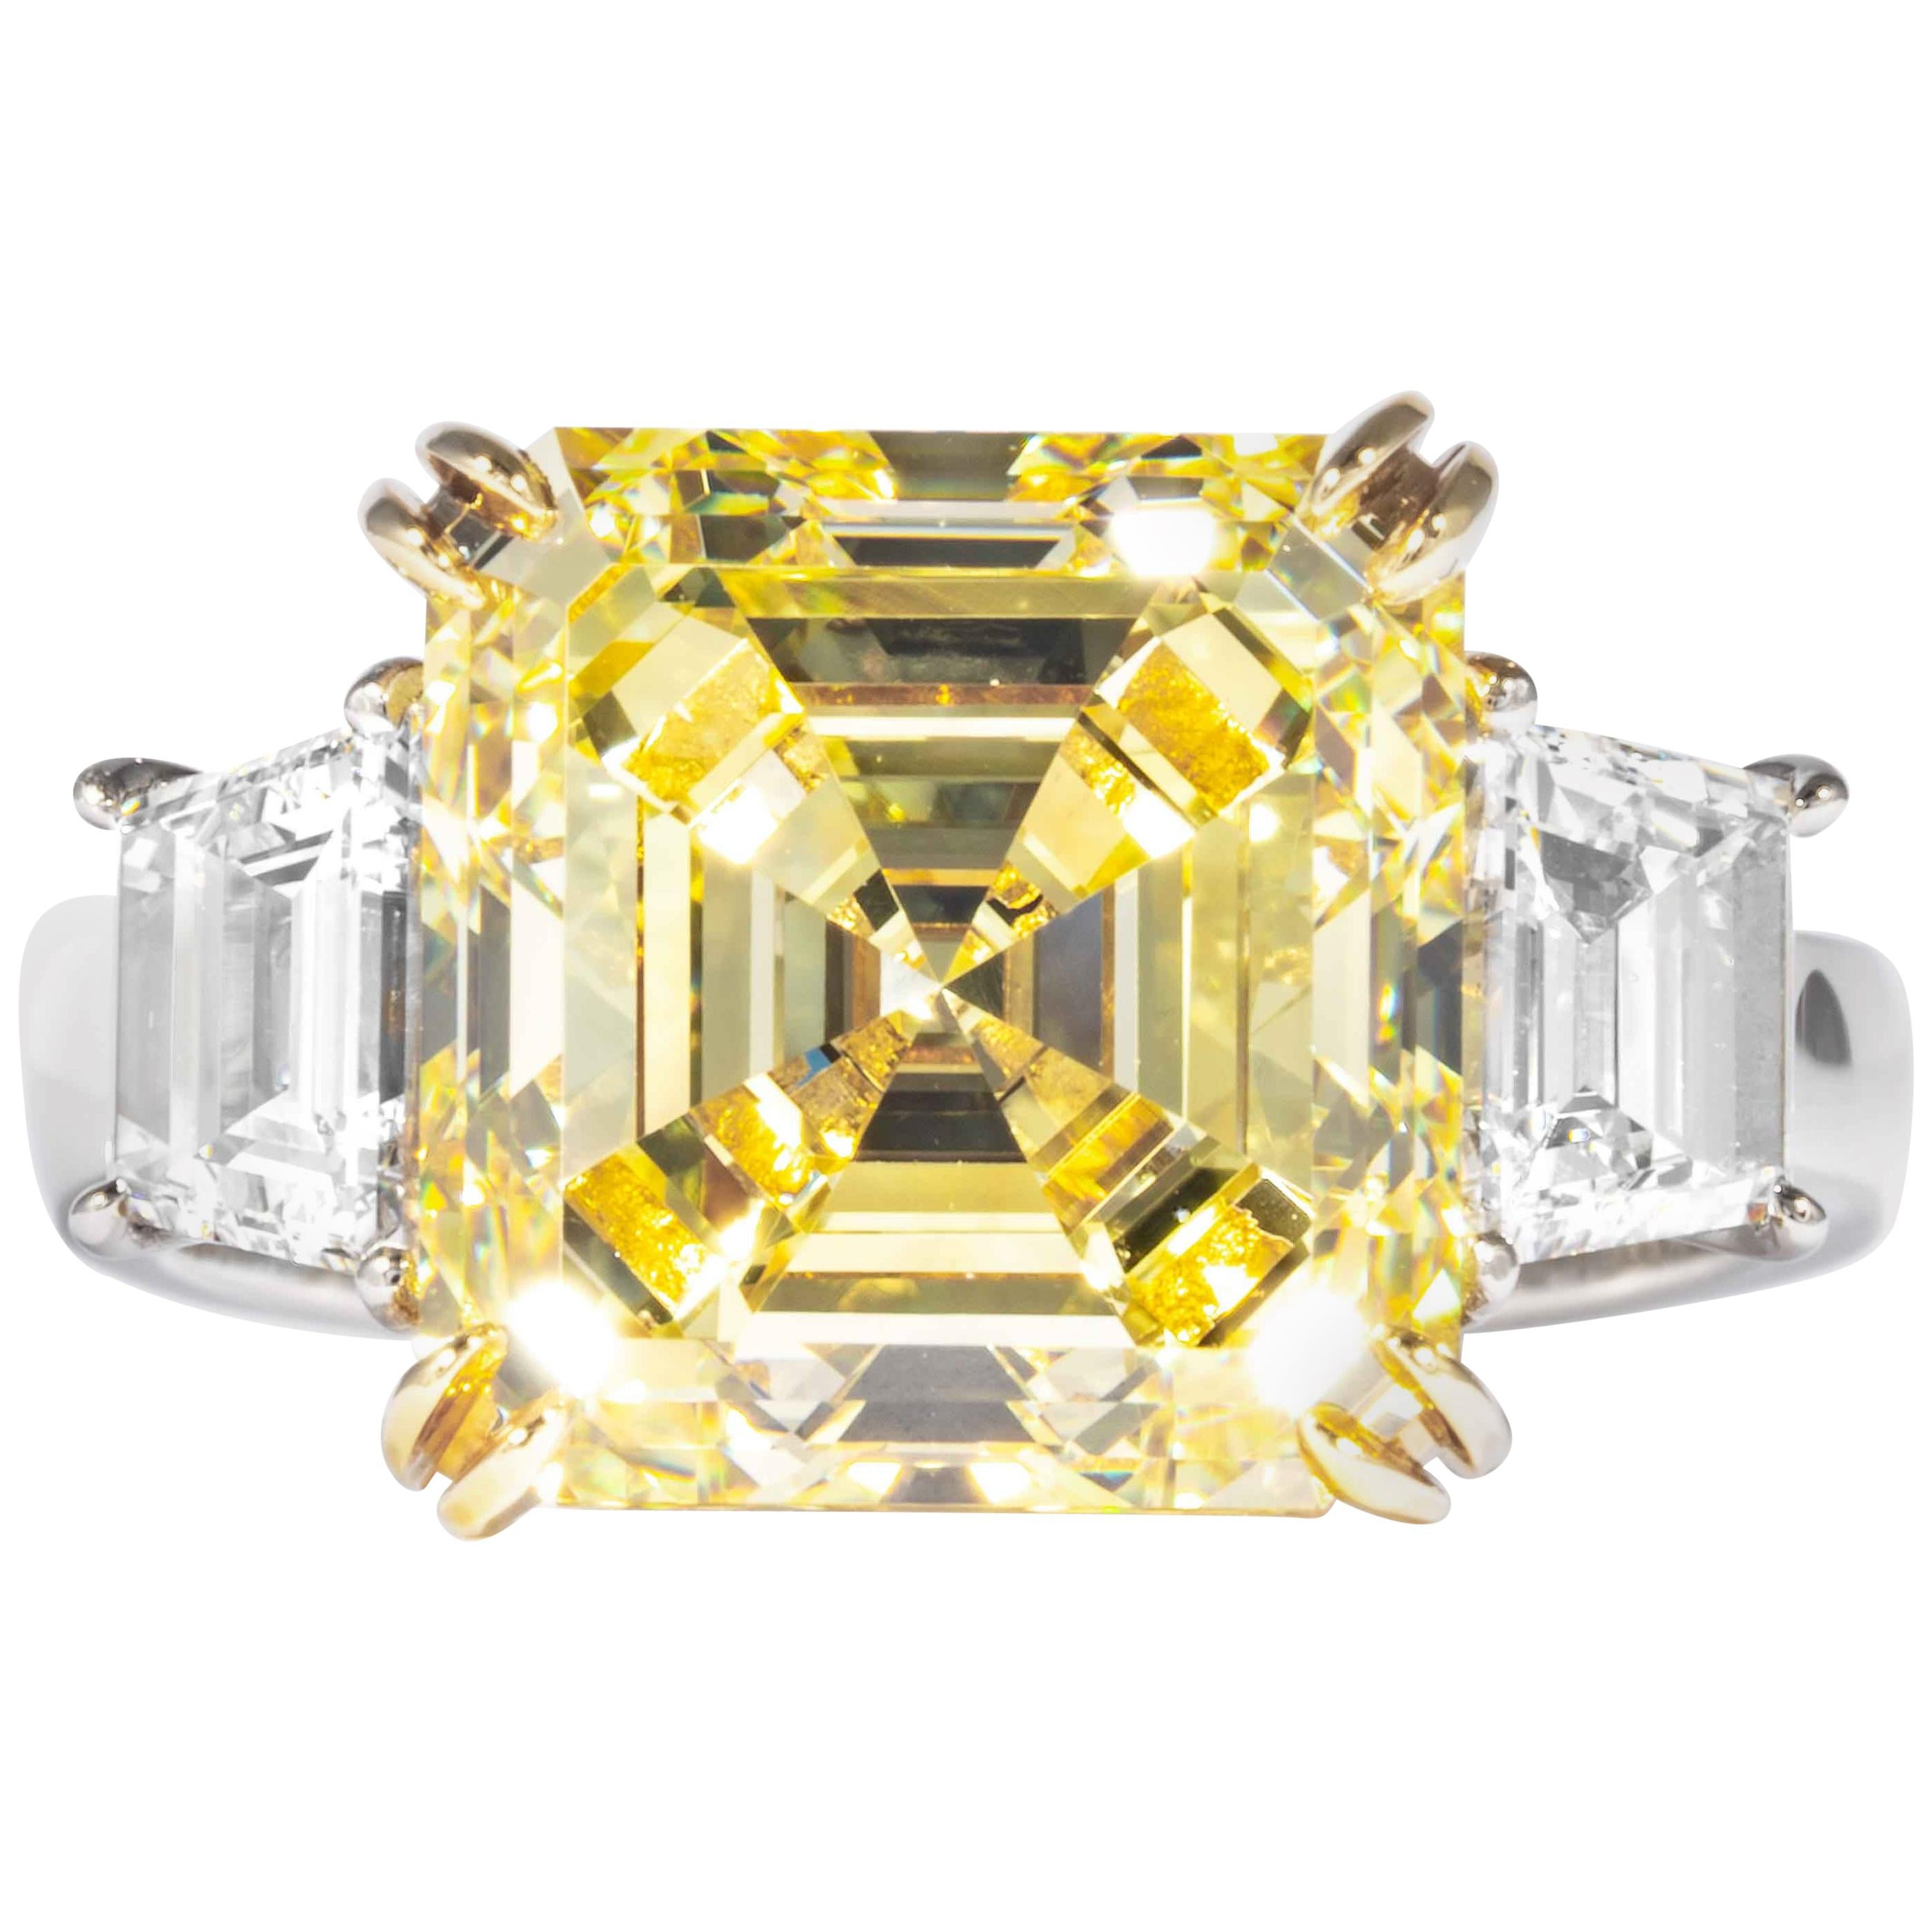 Shreve, Crump & Low GIA Certified 7.03 Ct Fancy Yellow Square Cut Diamond Ring